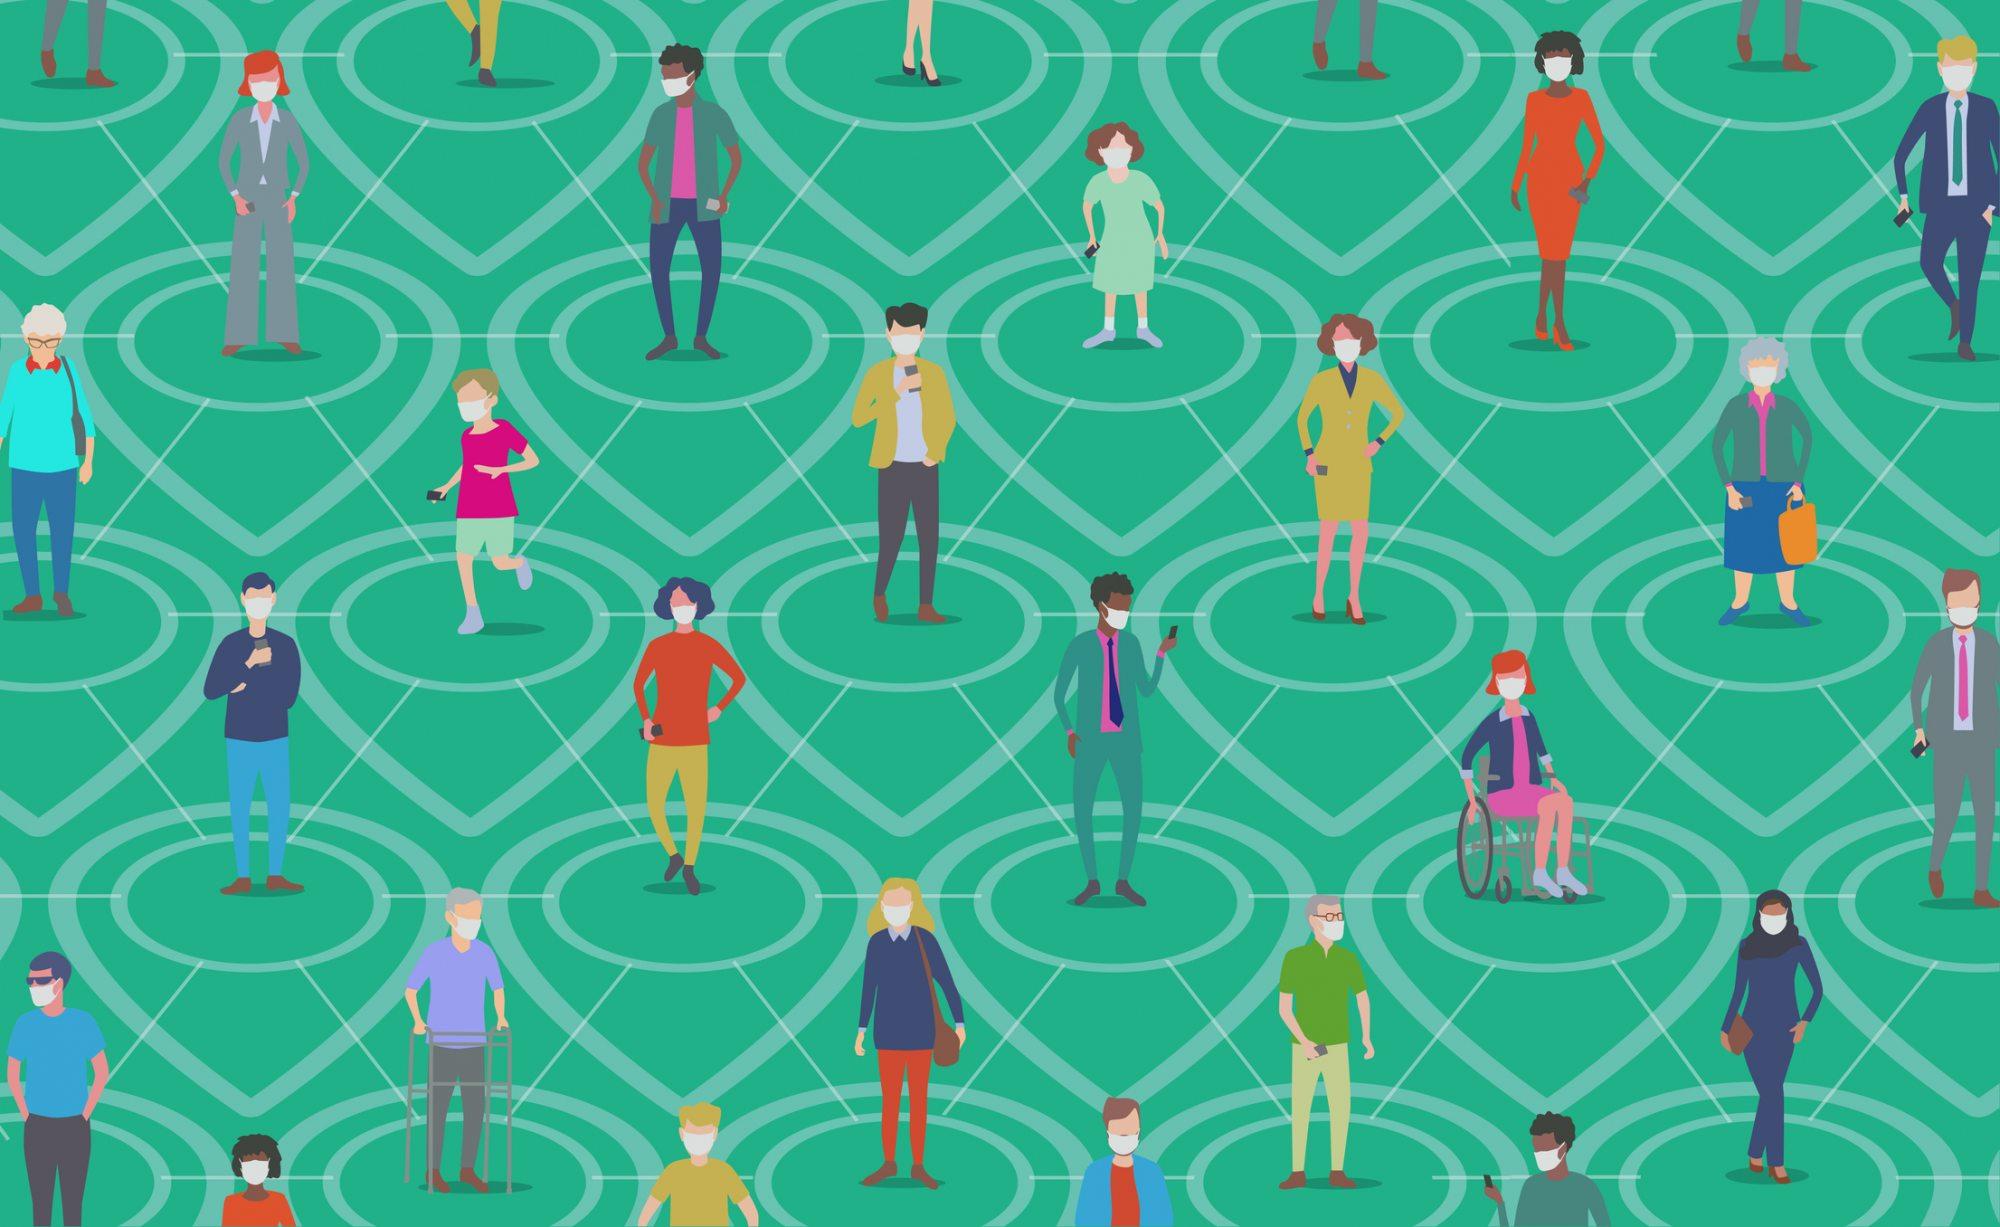 People social distancing illustrator